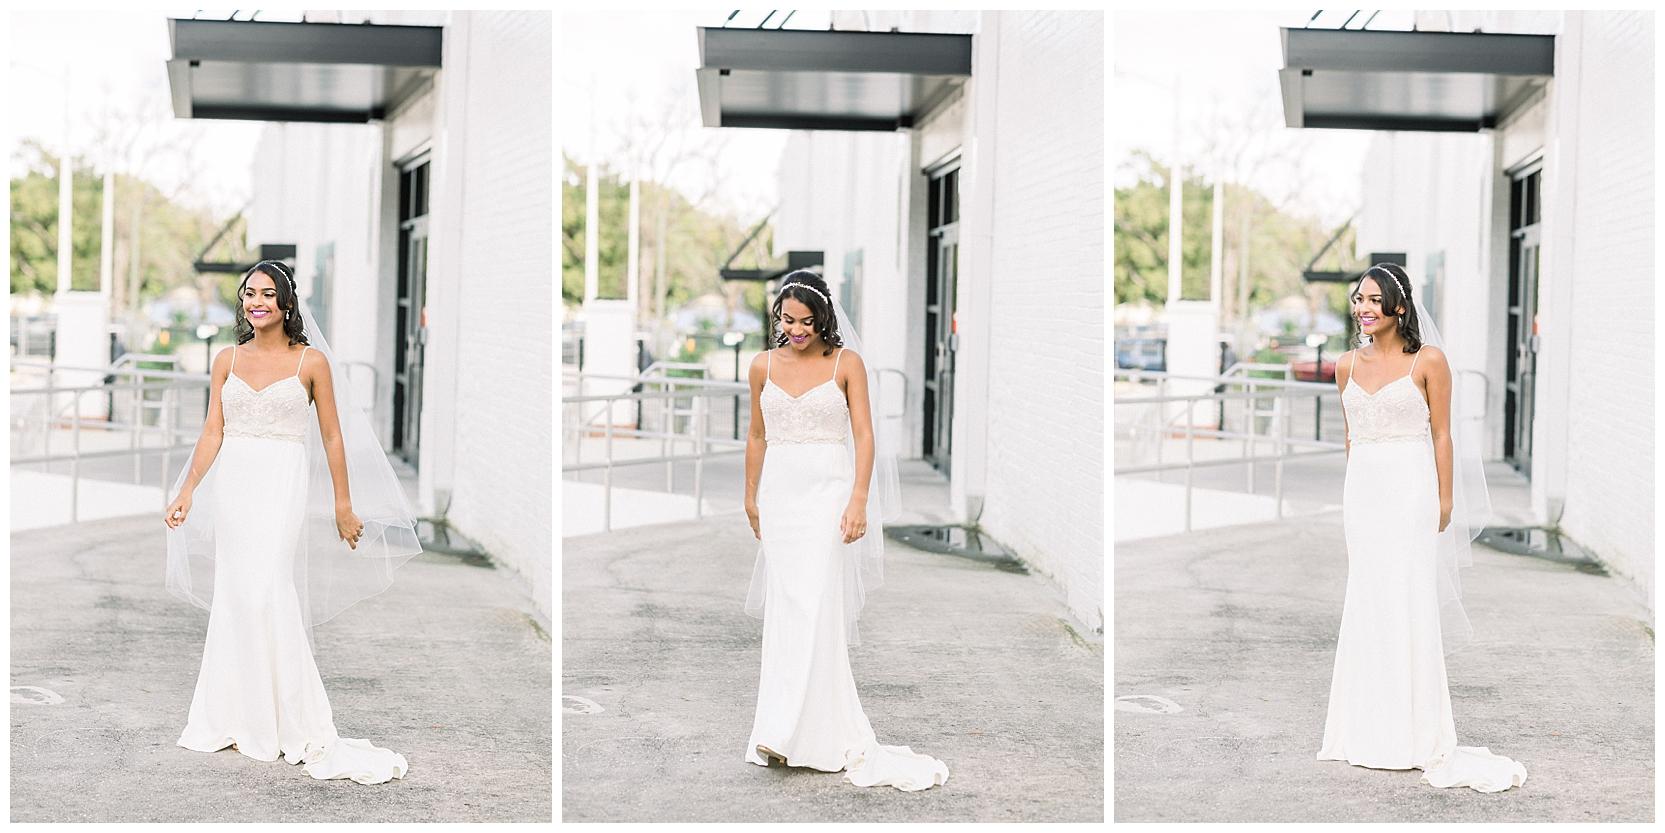 jessicafredericks_lakeland_tampa_wedding_purple_crazy hour_0039.jpg